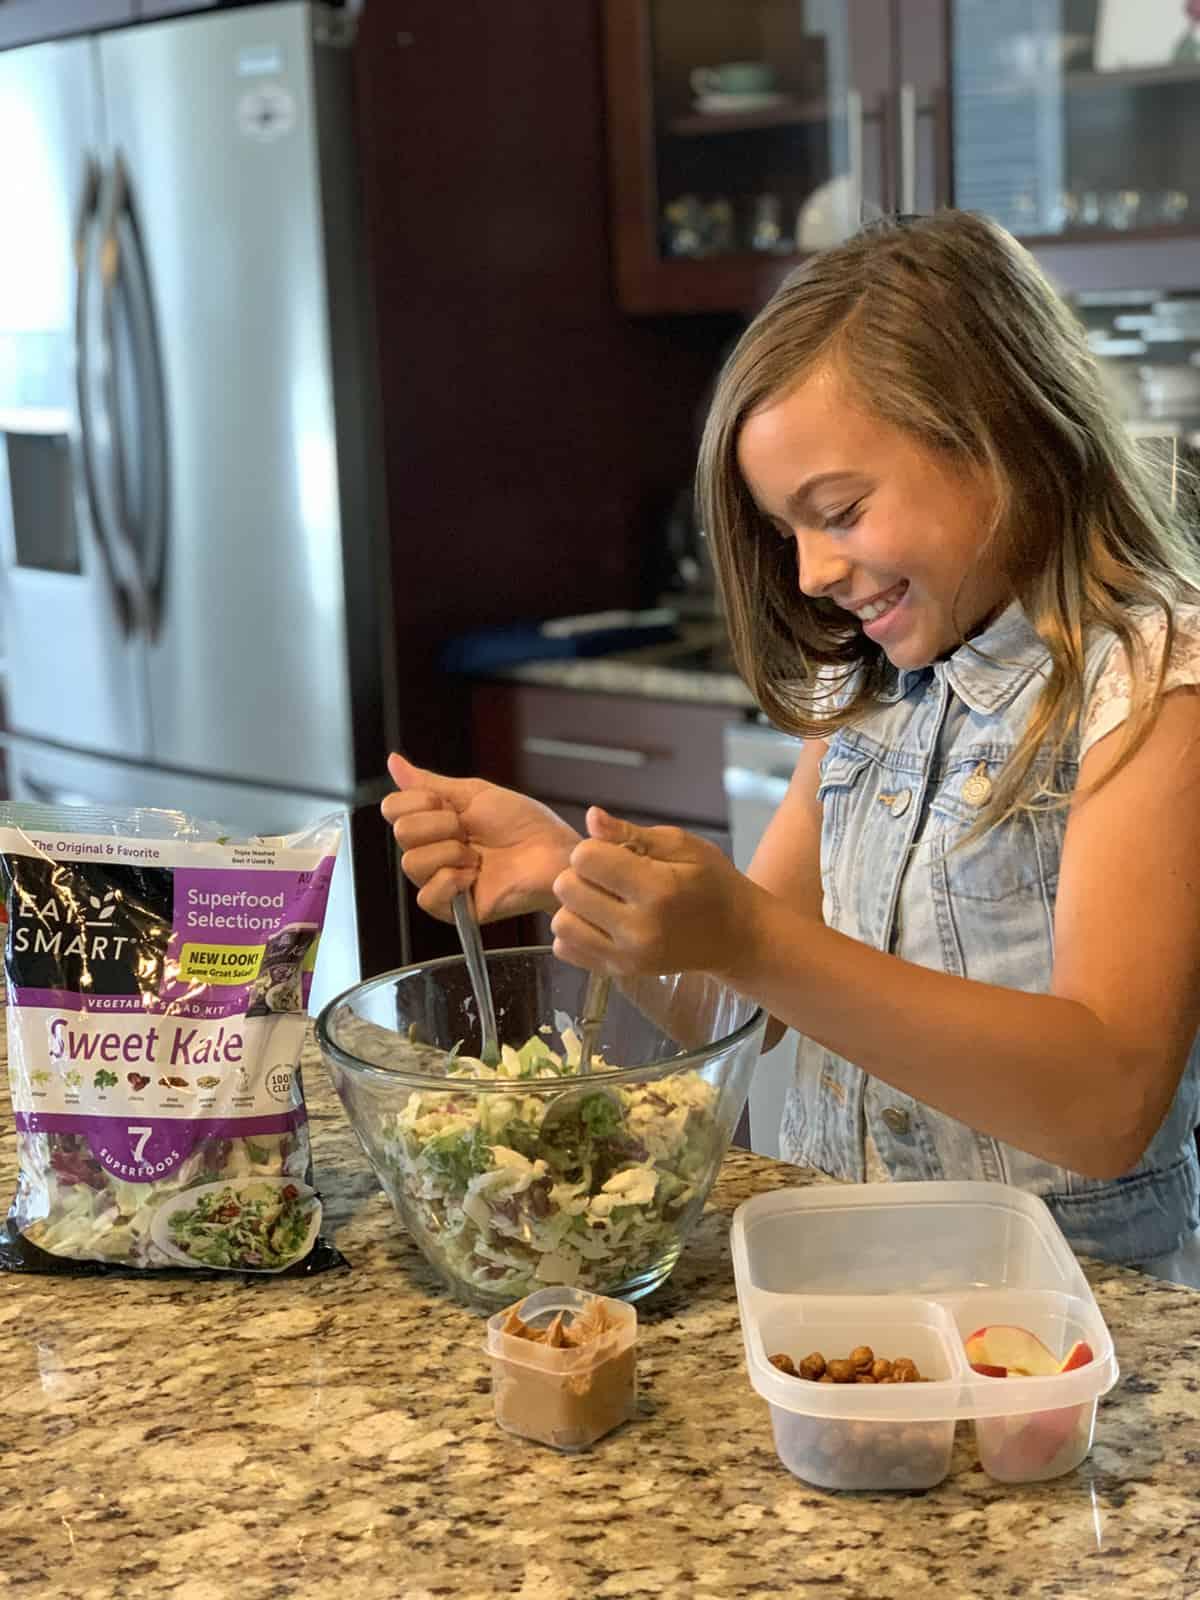 Girl tossing sweet kale salad salad in bowl